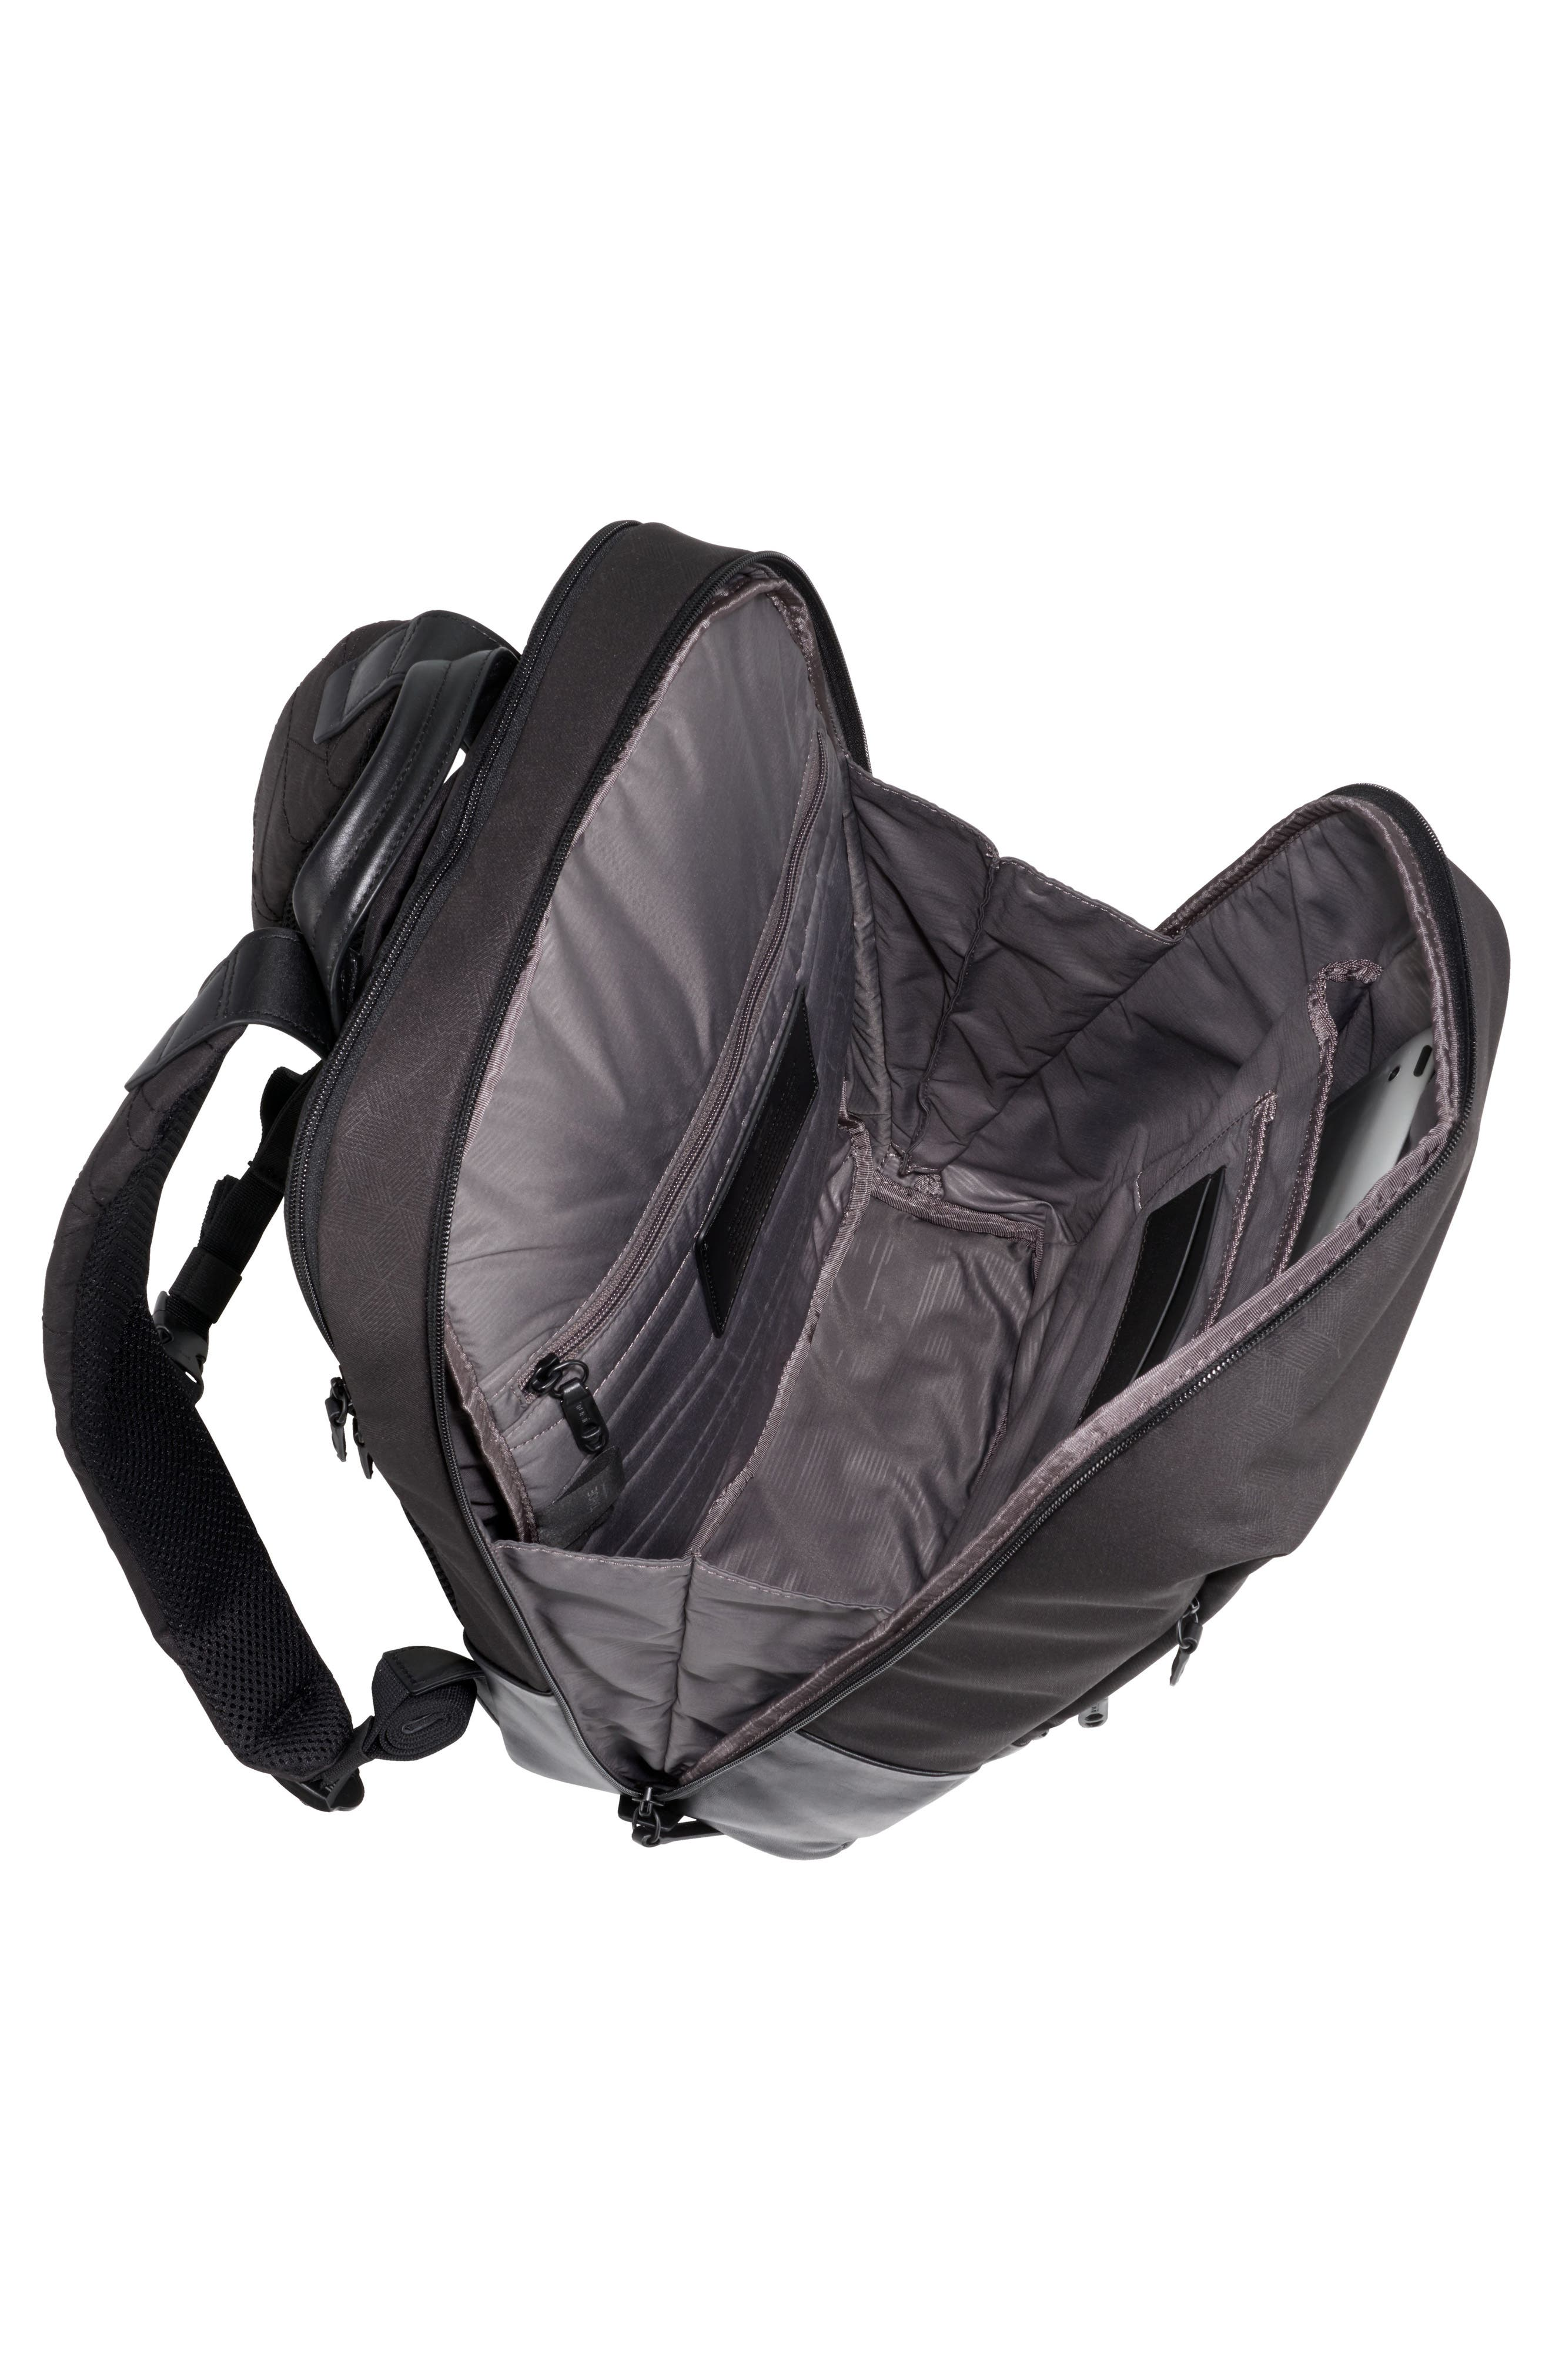 Butler Backpack,                             Alternate thumbnail 3, color,                             Black